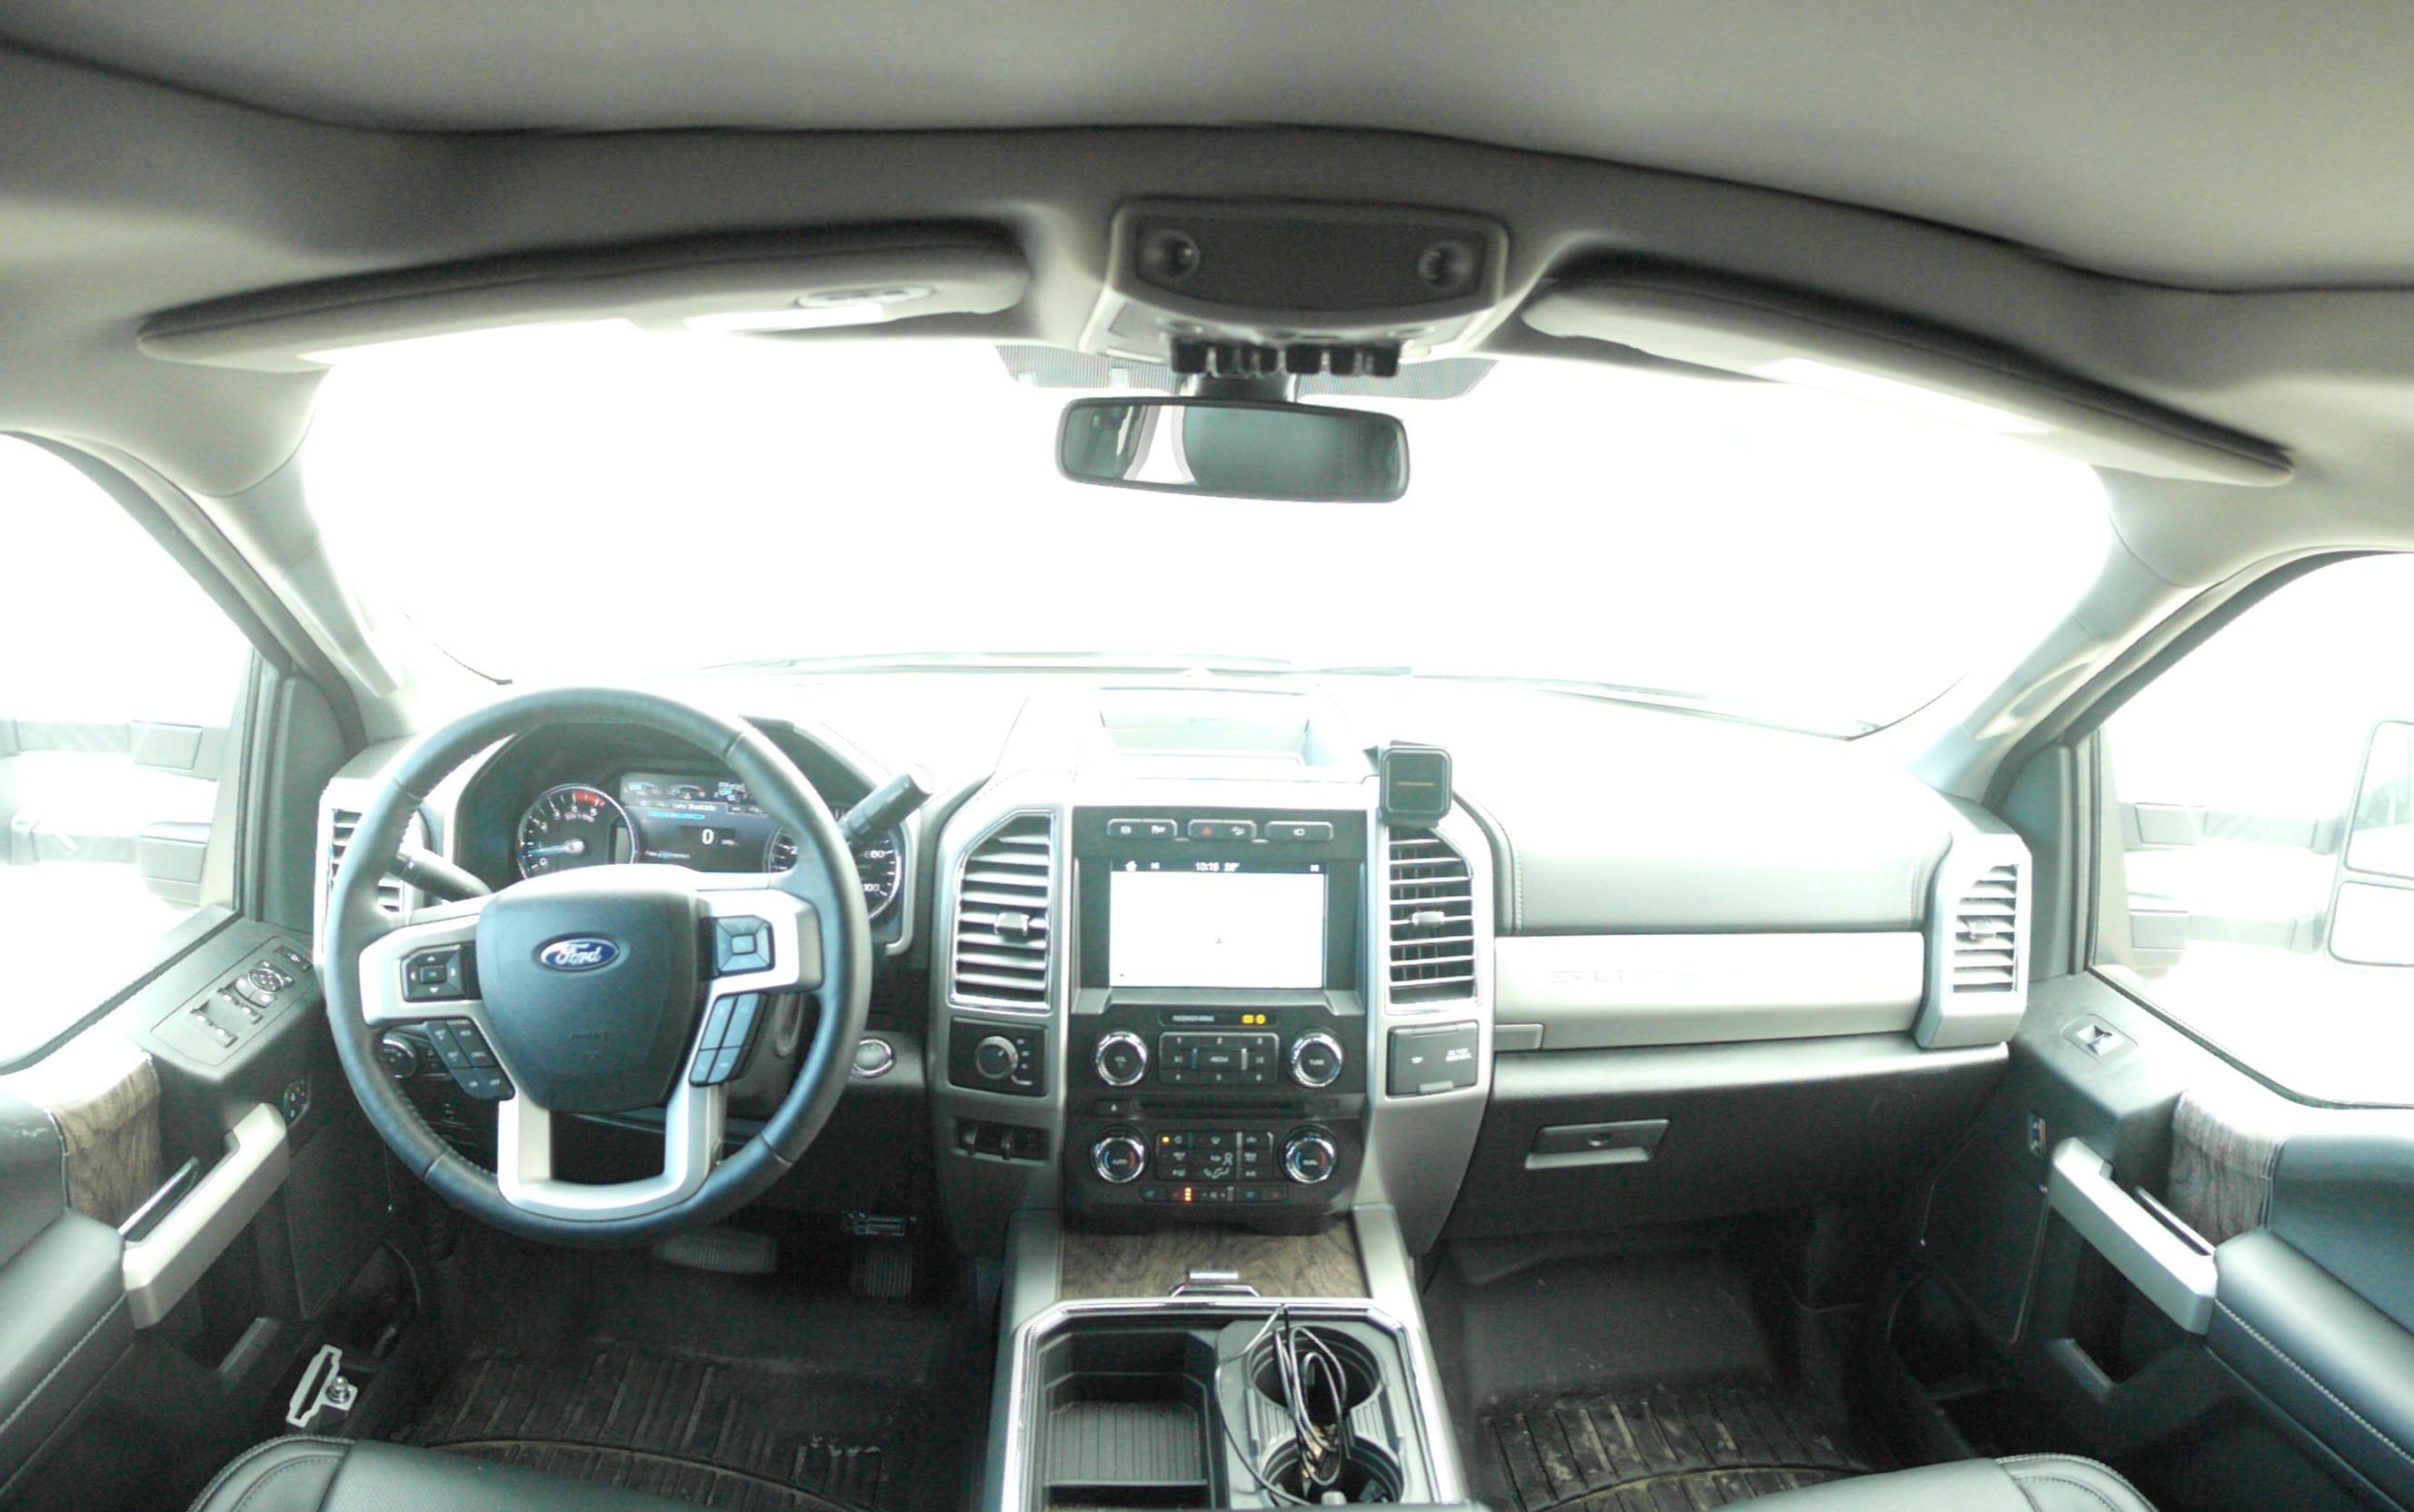 Ford 450 interior